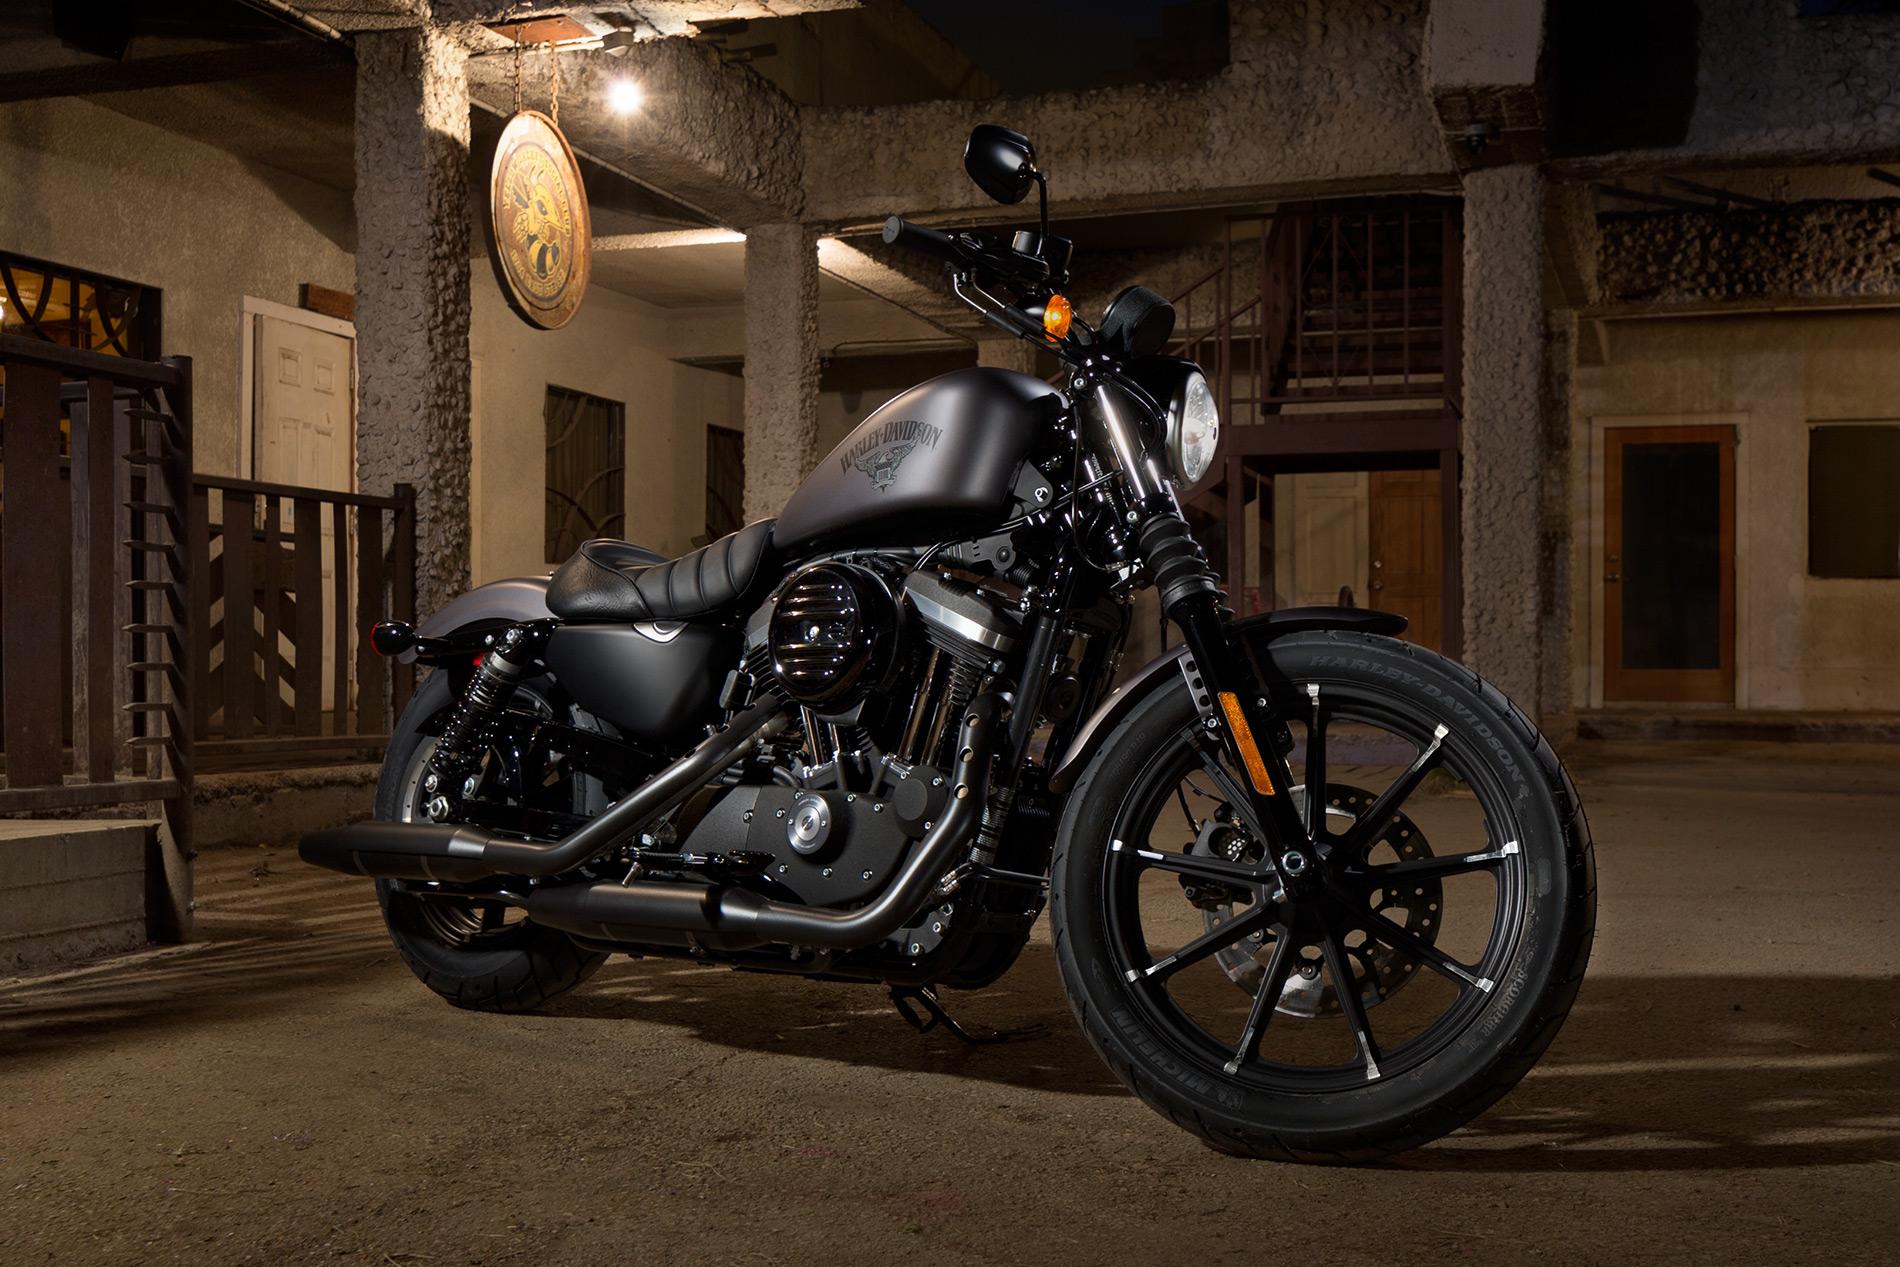 Reviews of 2016 Harley Davidson Sportster iron 883